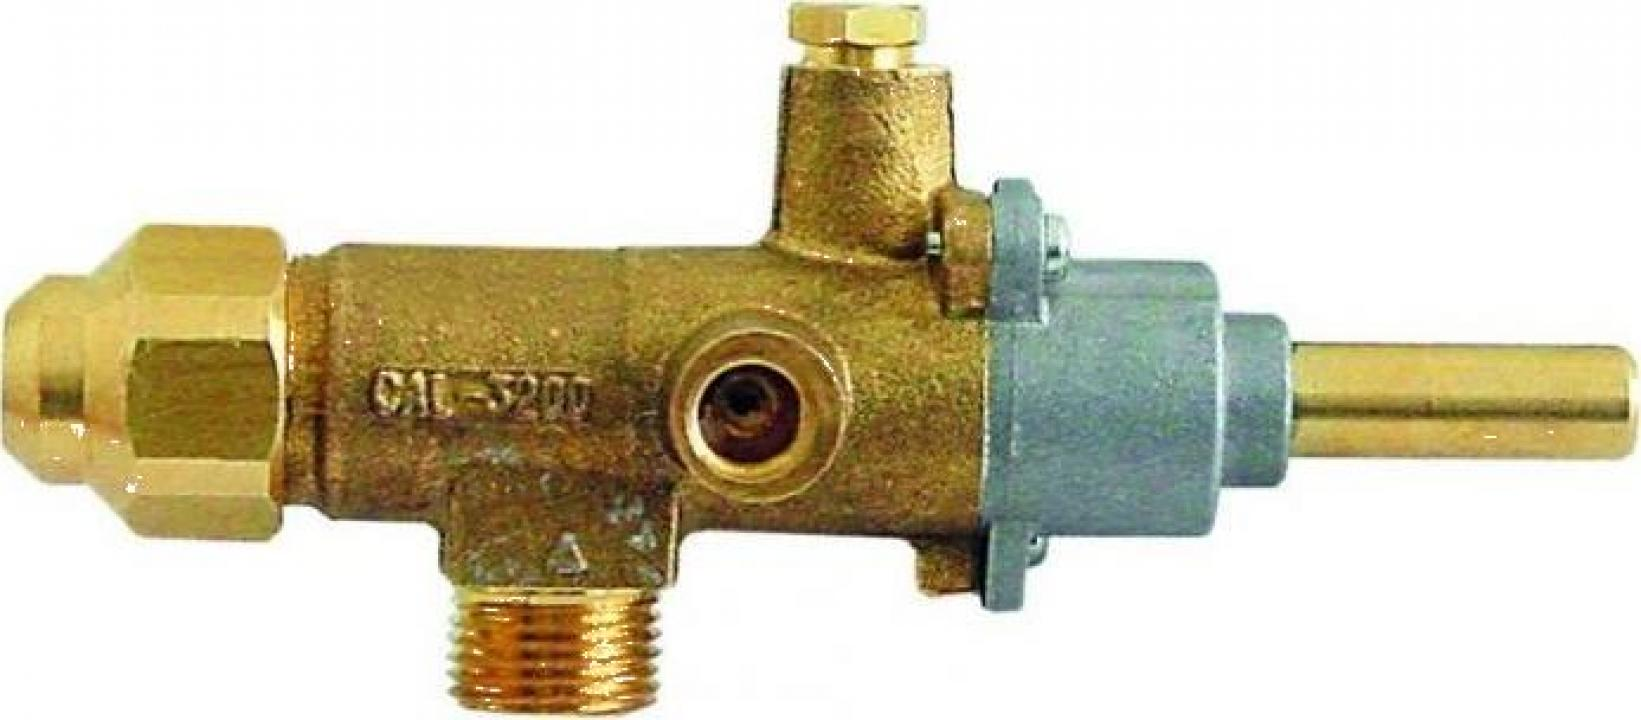 Robinet de gaz Copreci CAL-3200, intrare gaz M18x1.5